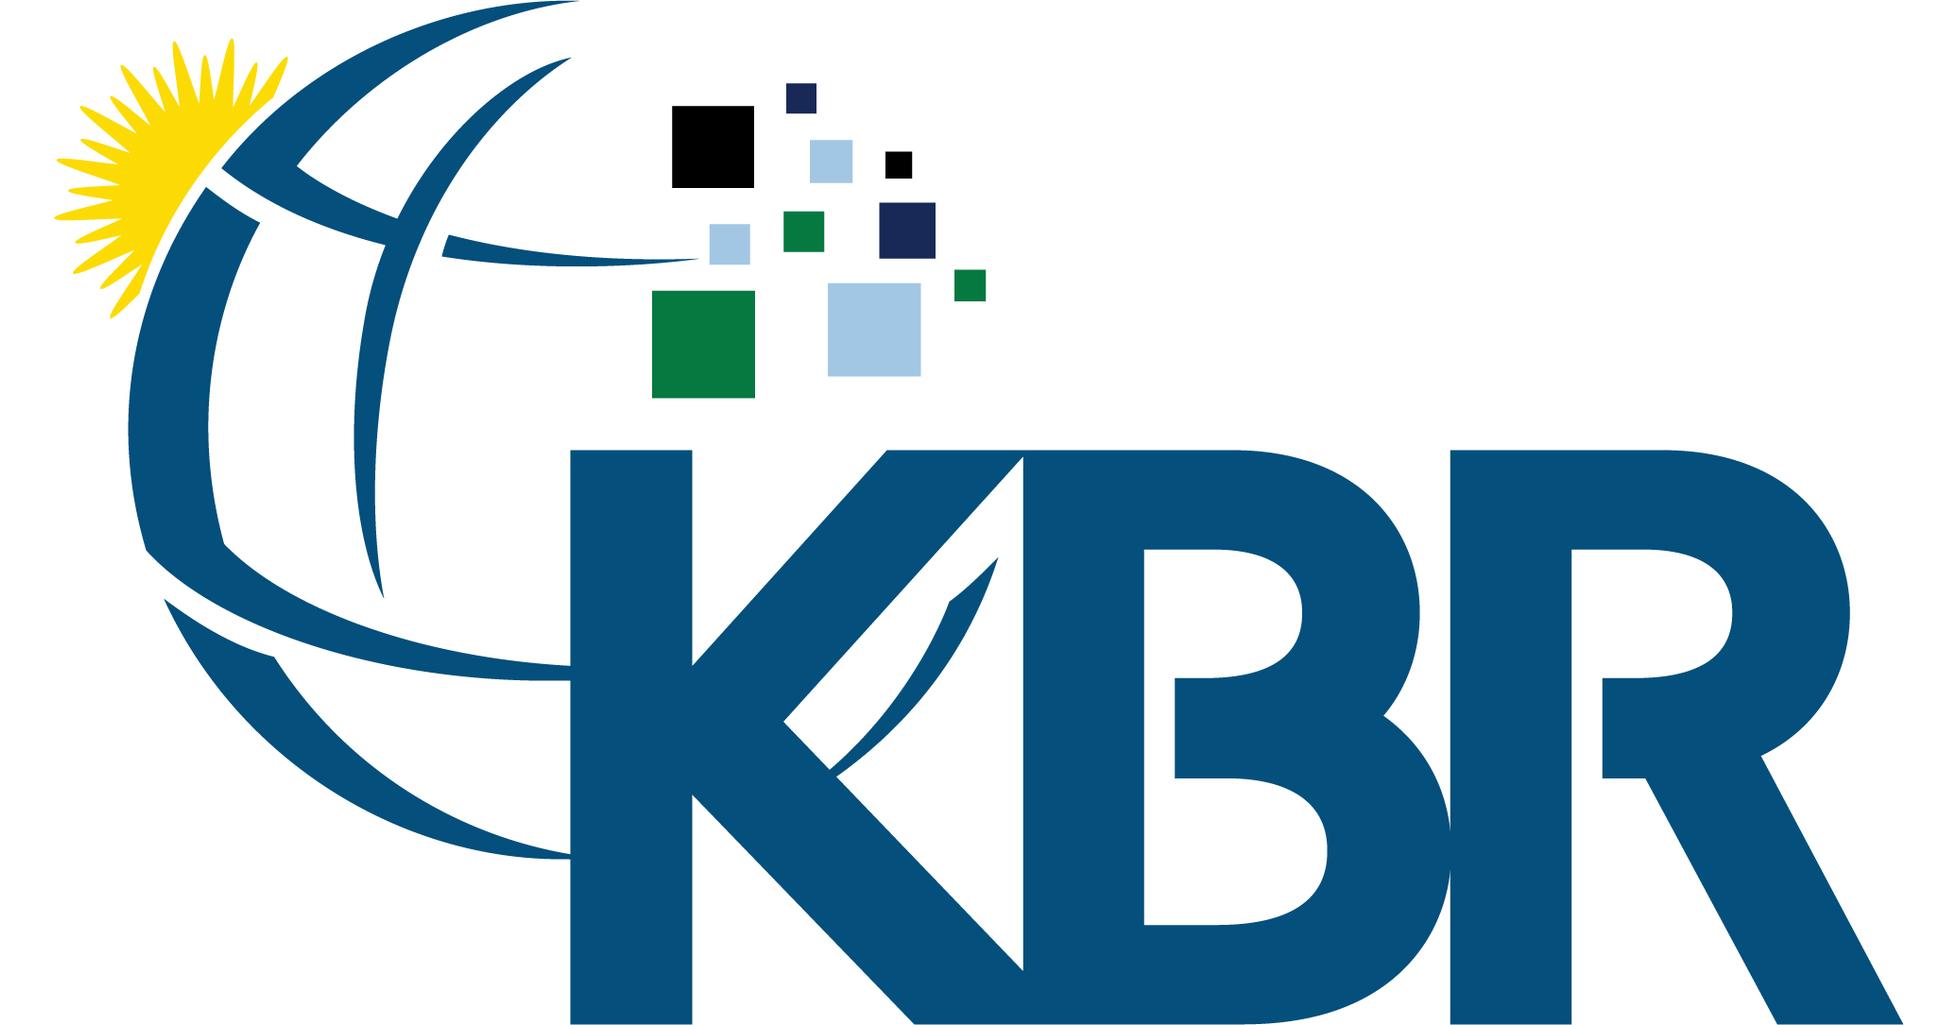 KBR Selected as Preferred Bidder for Freeport LNG Train 4.